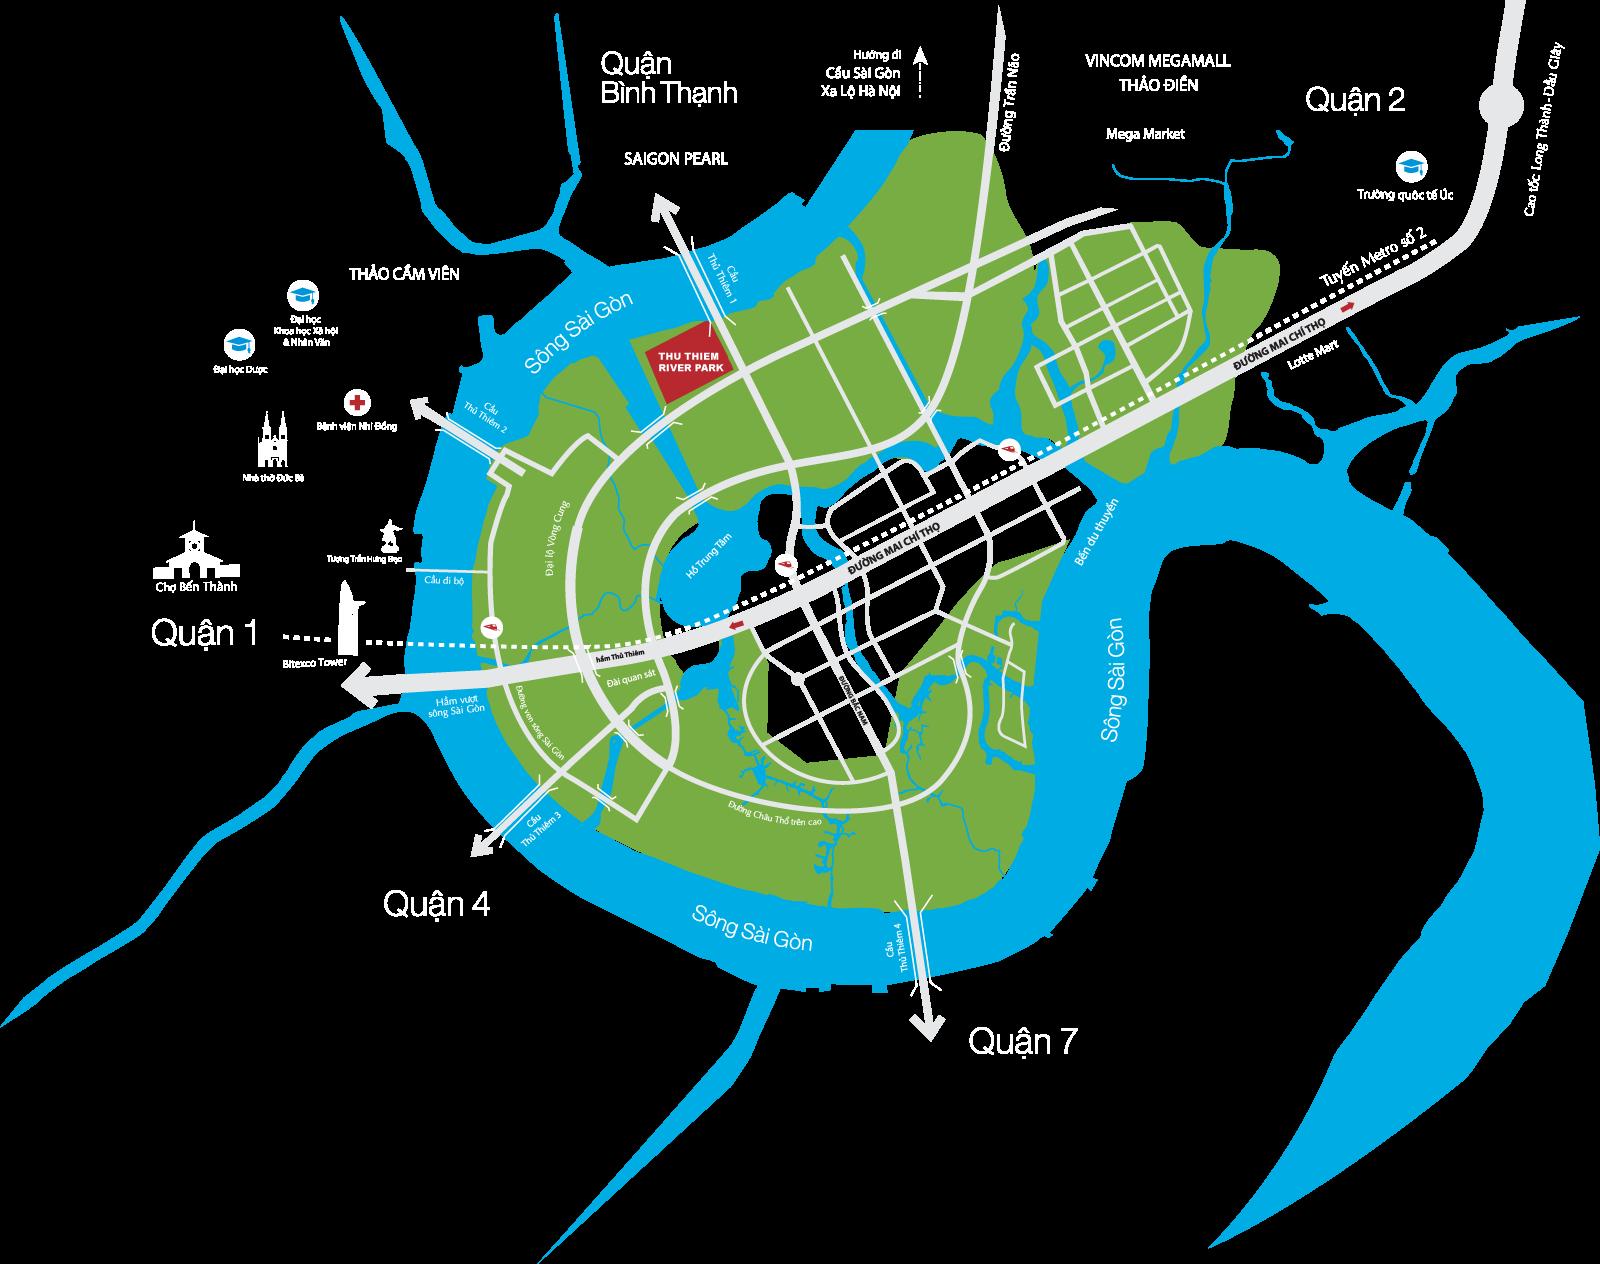 Thủ Thiêm River Park